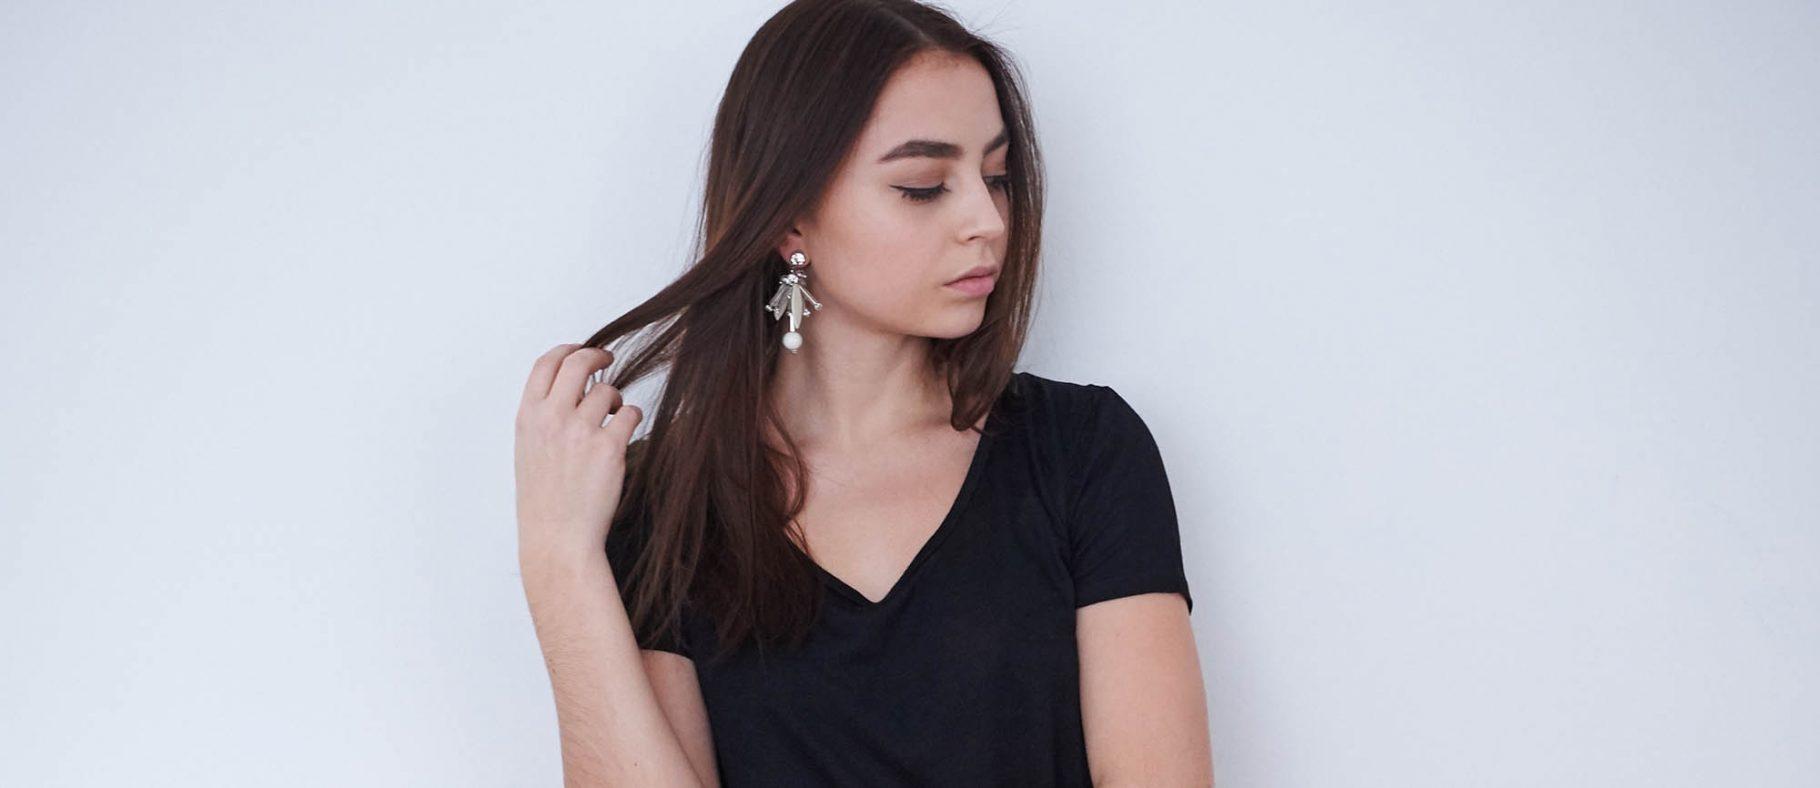 Alina – 15 Fakten über mich